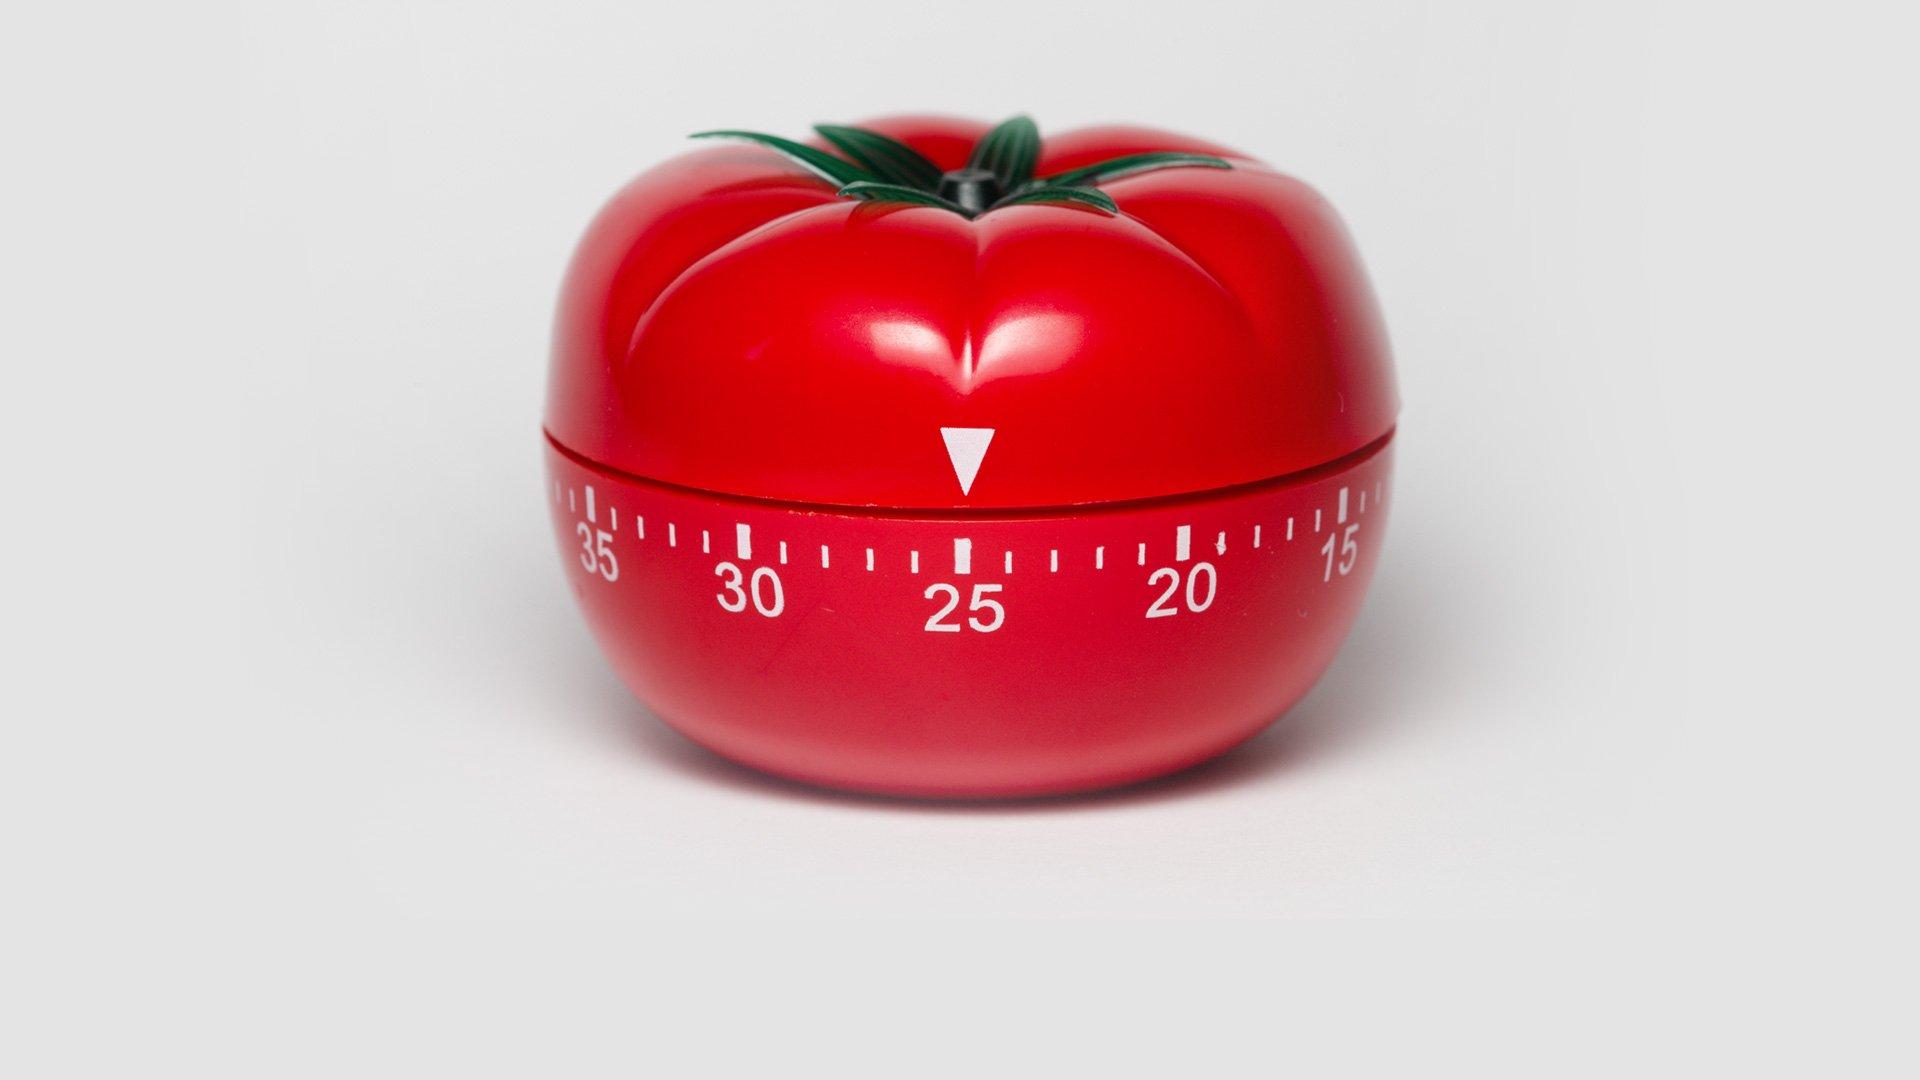 Técnica Pomodoro